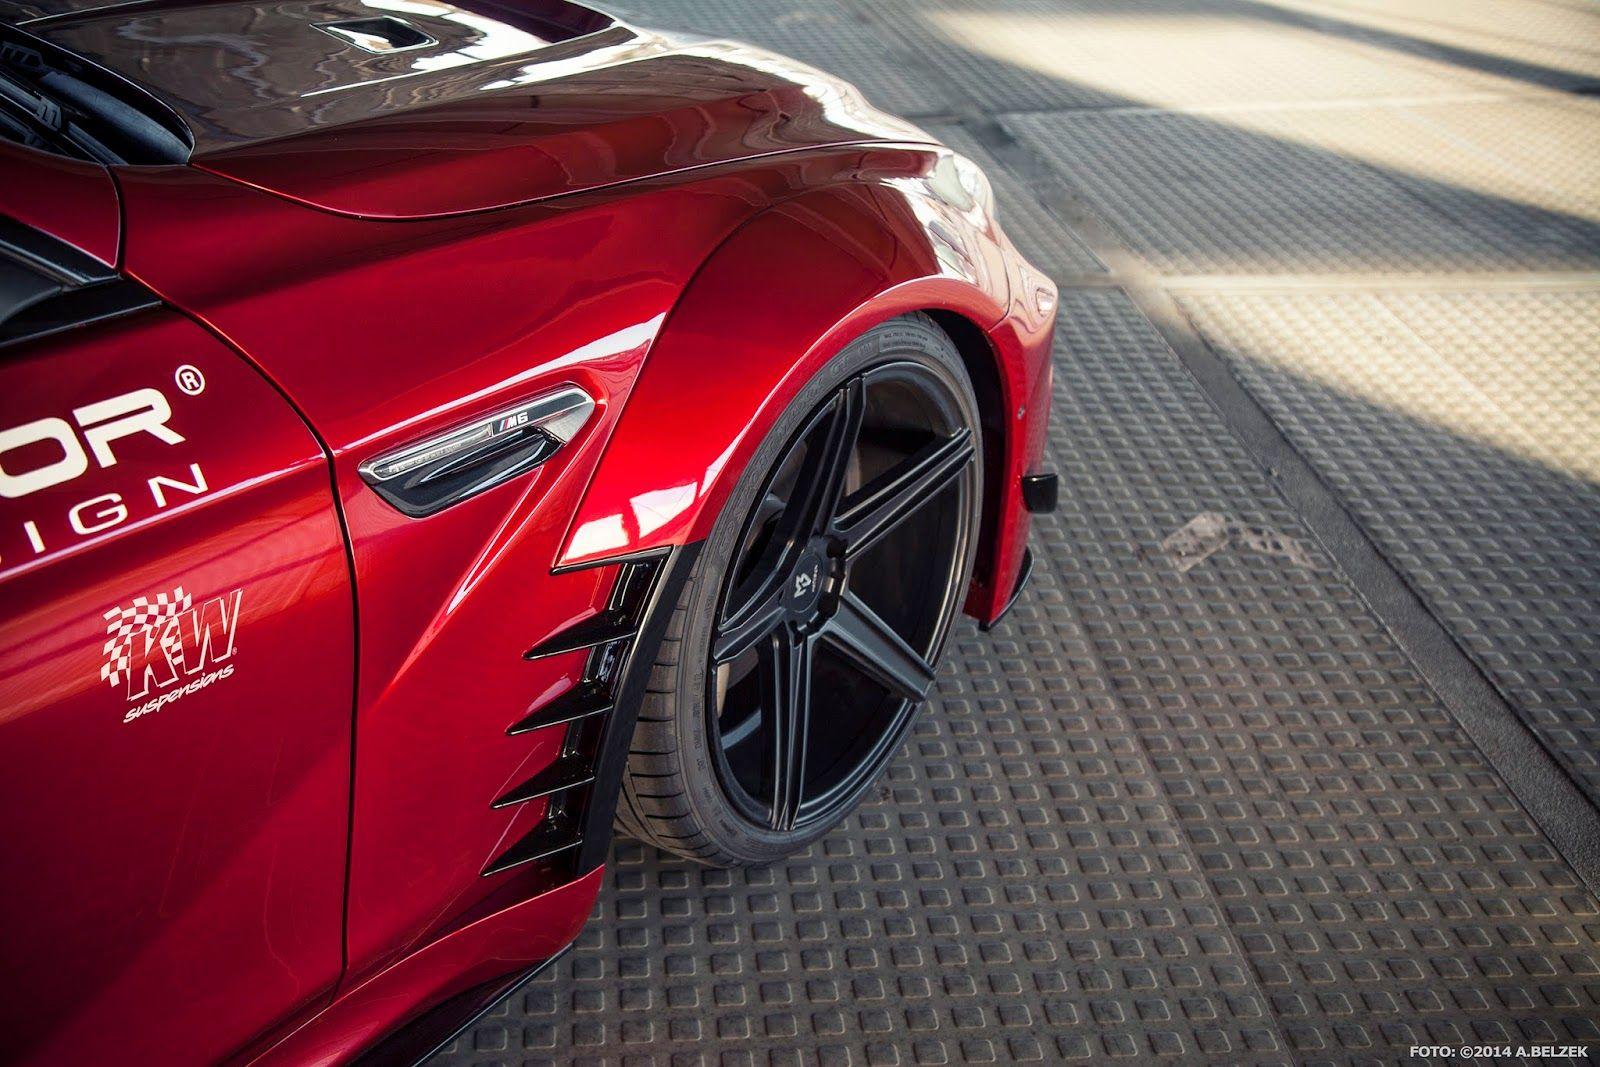 Prior Design BMW 6 Series Widebody Revealed | ToP SpEEd